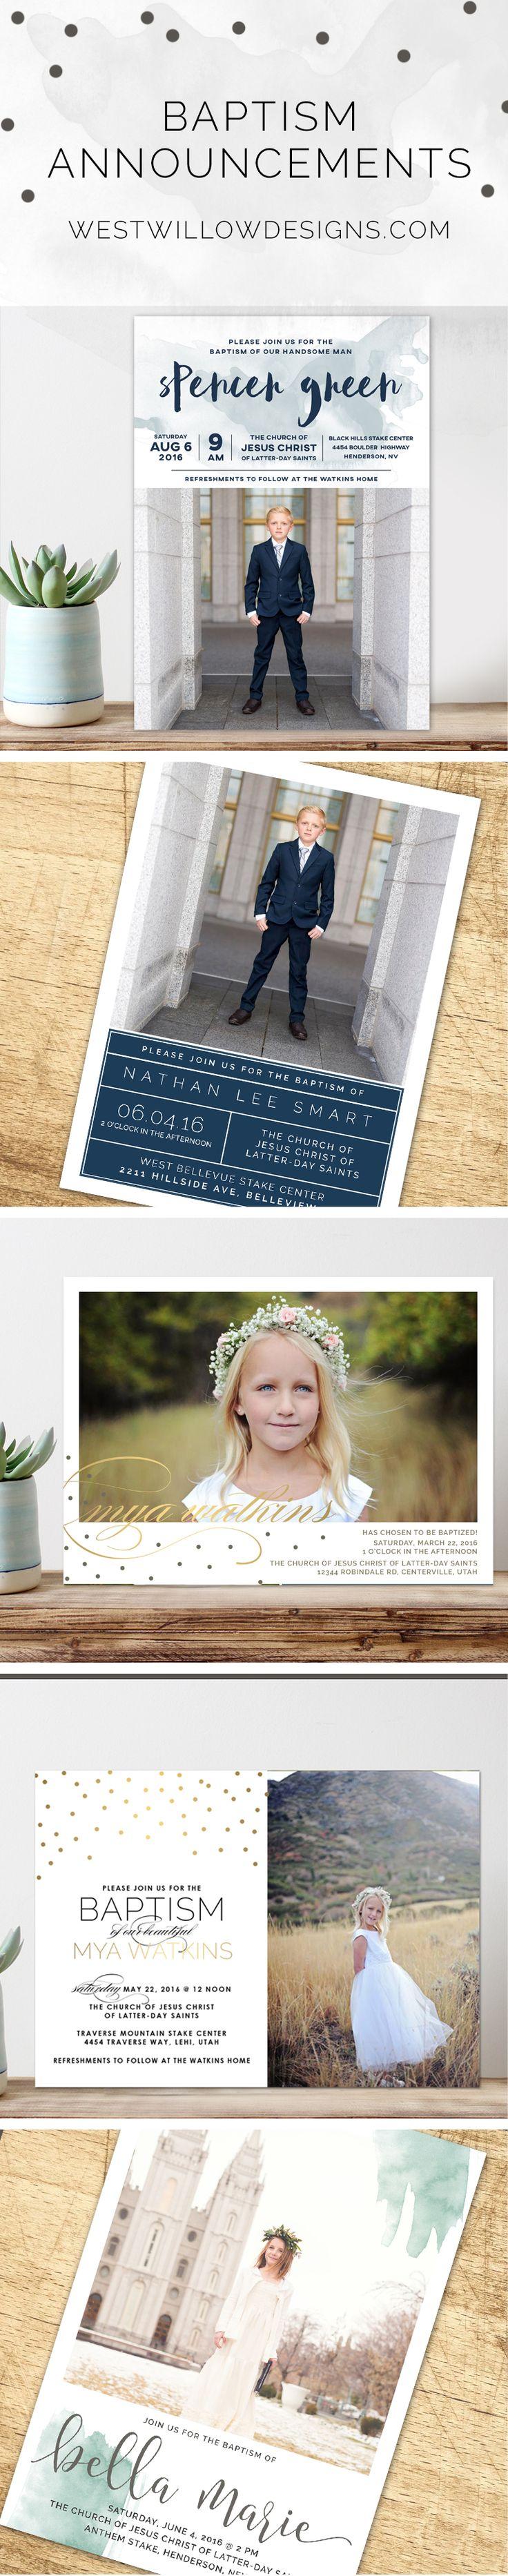 Custom printable baptism invitations